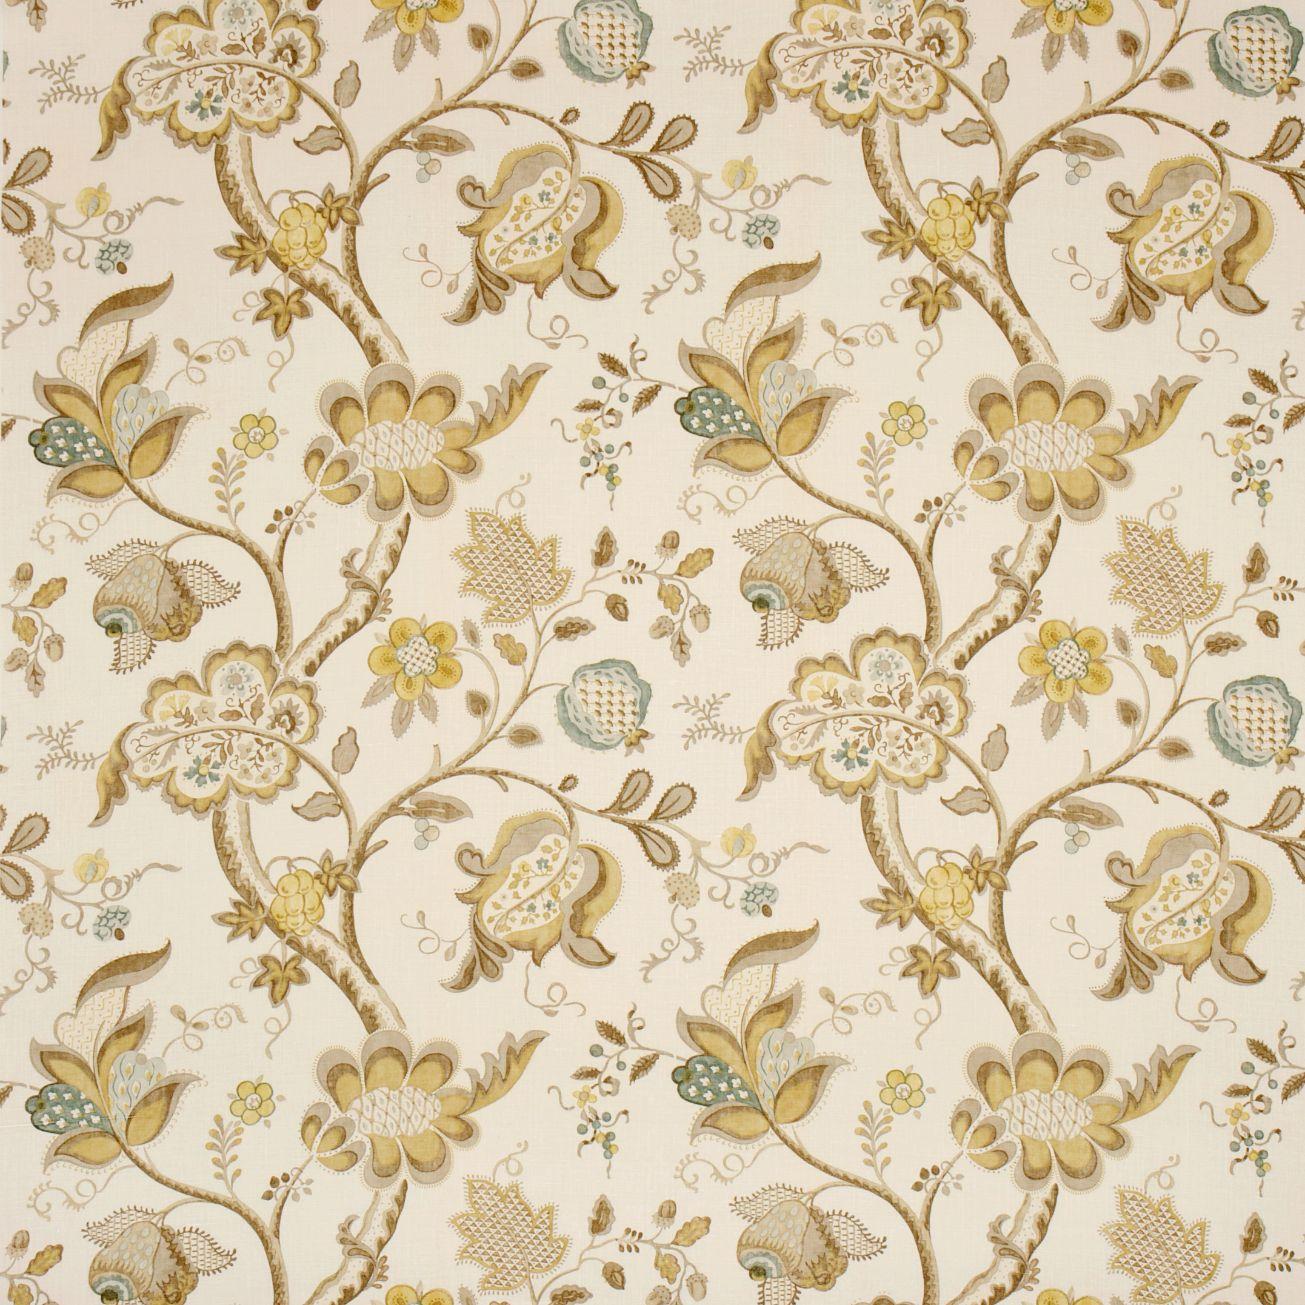 1305x1305px 1920 Vintage Wallpaper Design Wallpapersafari